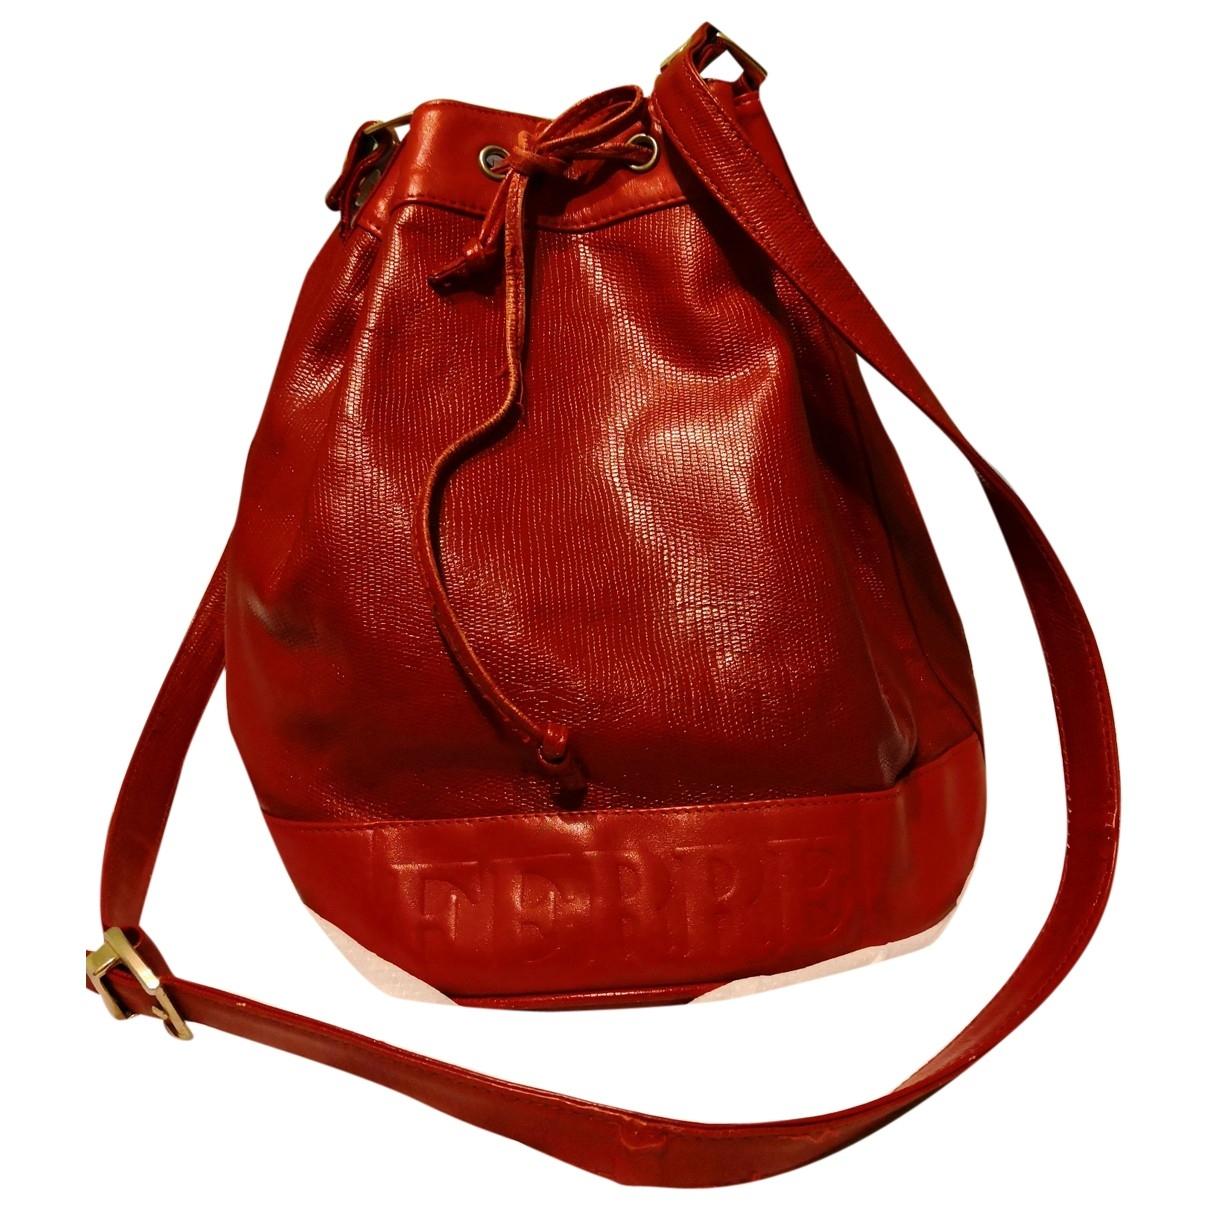 Gianfranco Ferré \N Red Leather handbag for Women \N